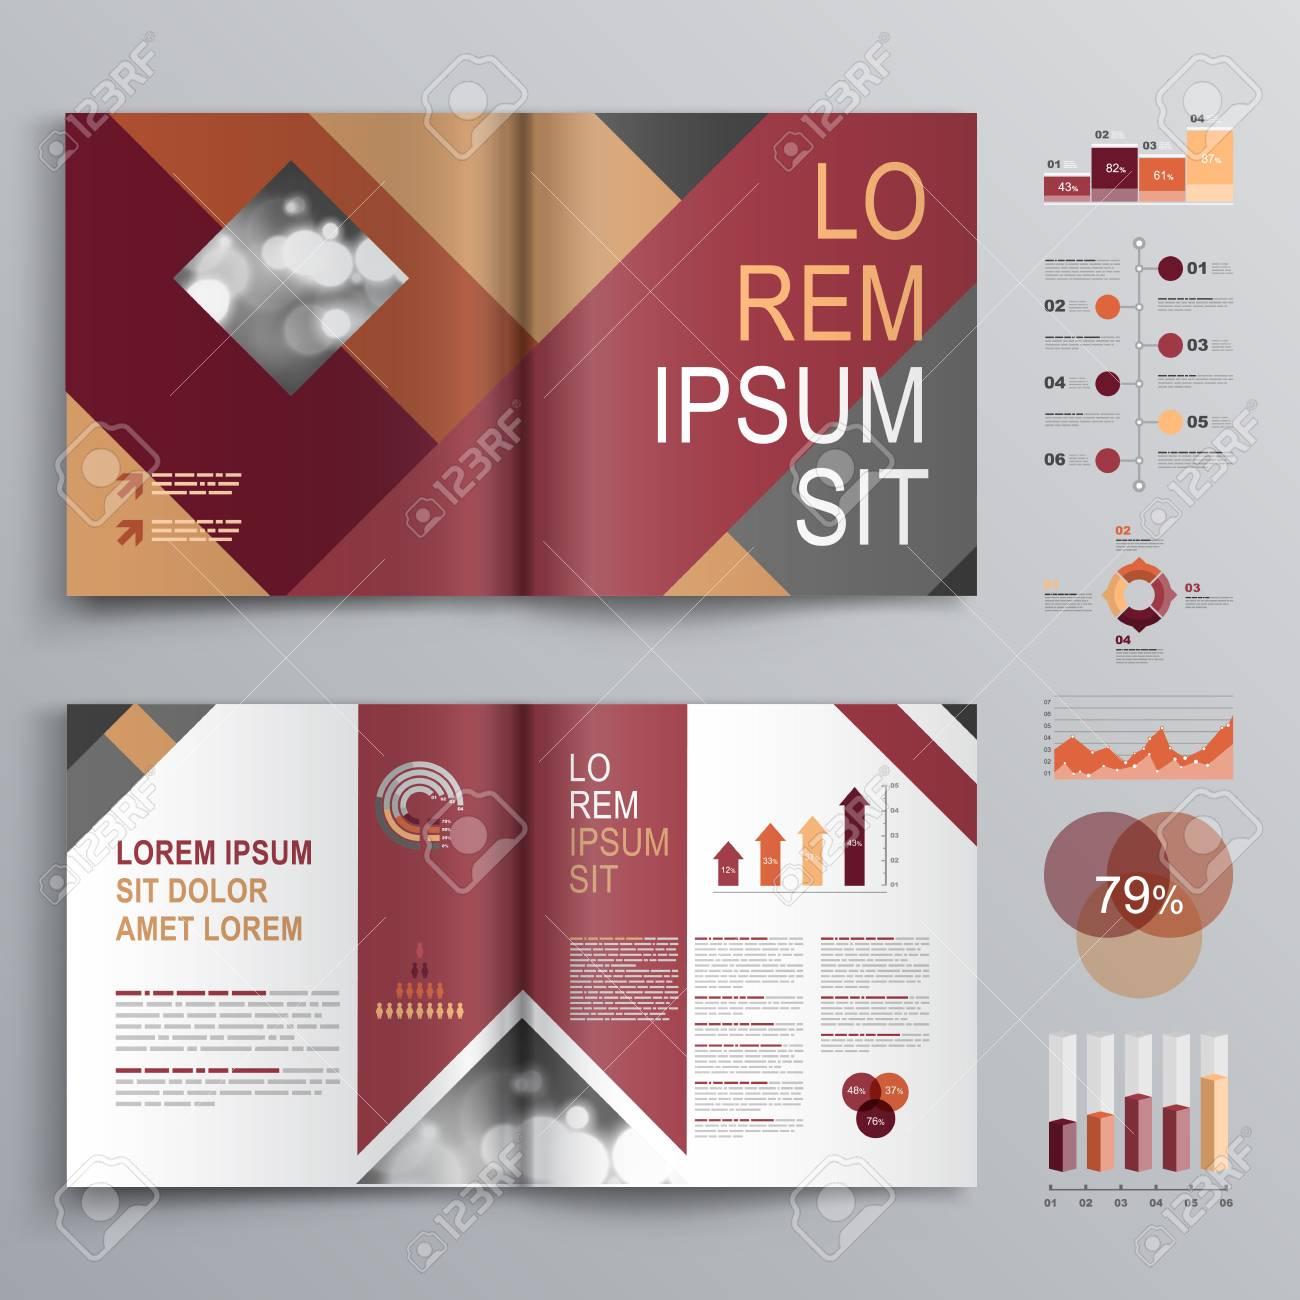 Fashion Design Brochure Template Fashion Design Brochure Templates